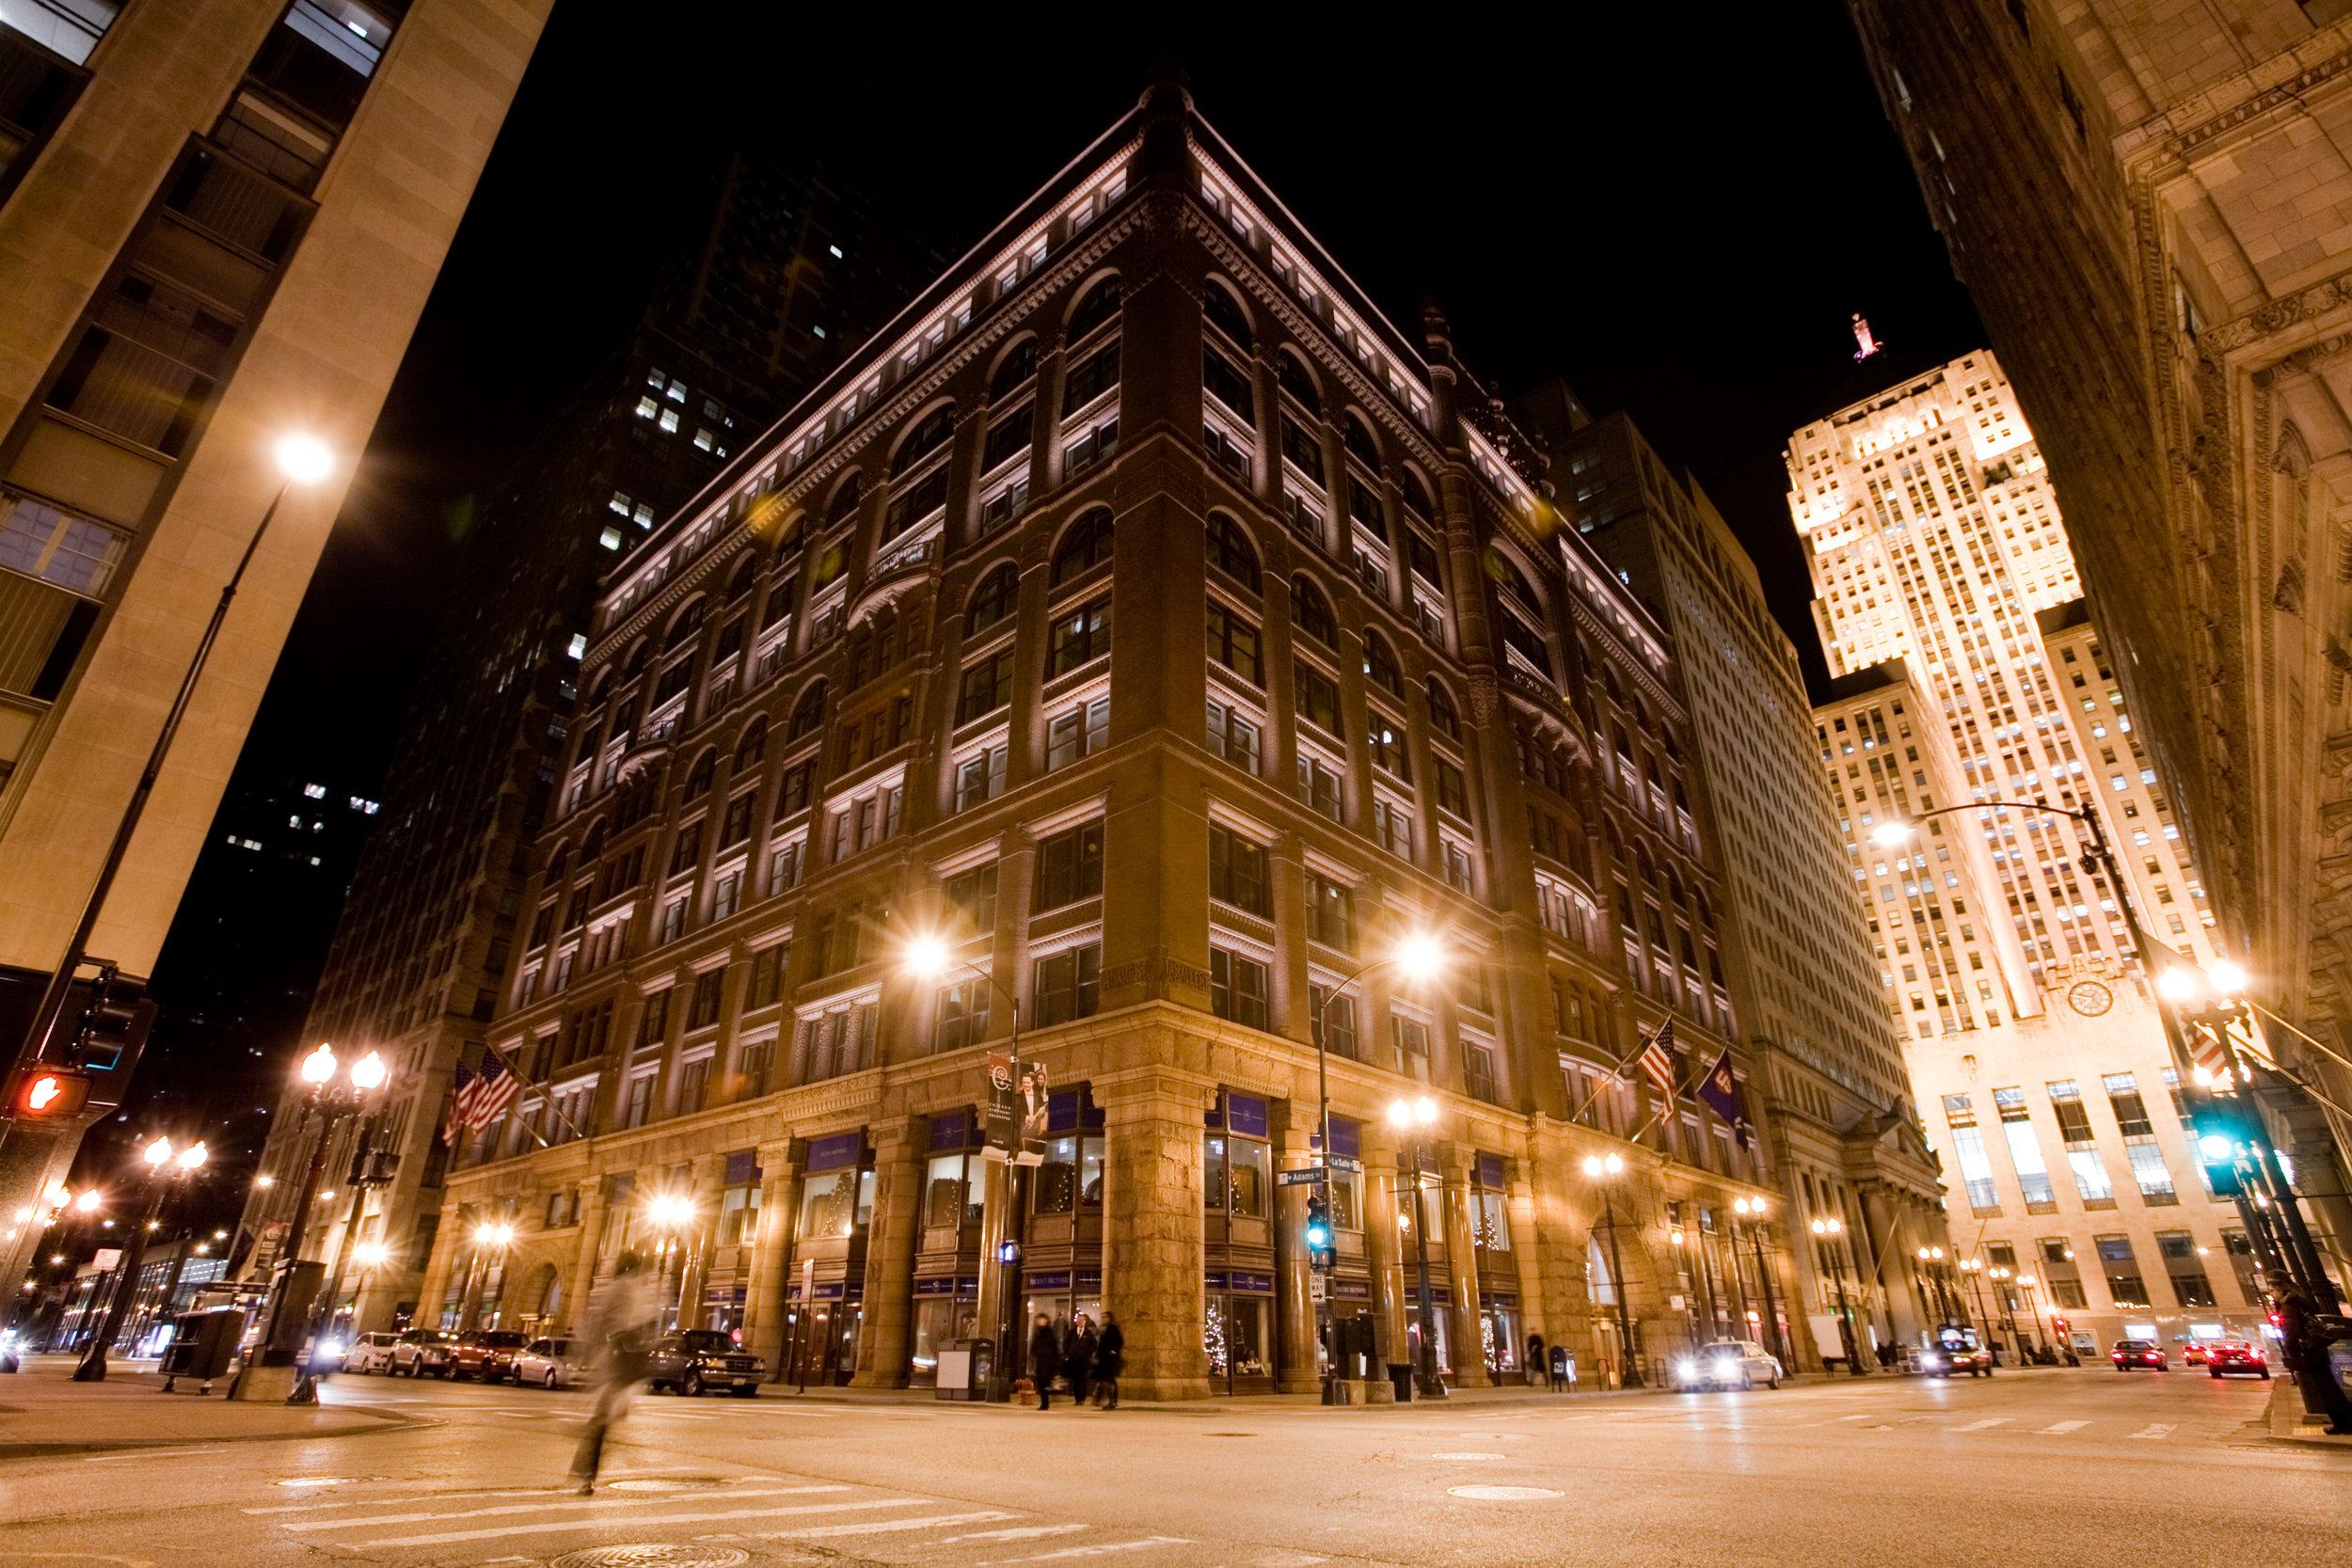 Exterior - Corner, Night 1.jpg